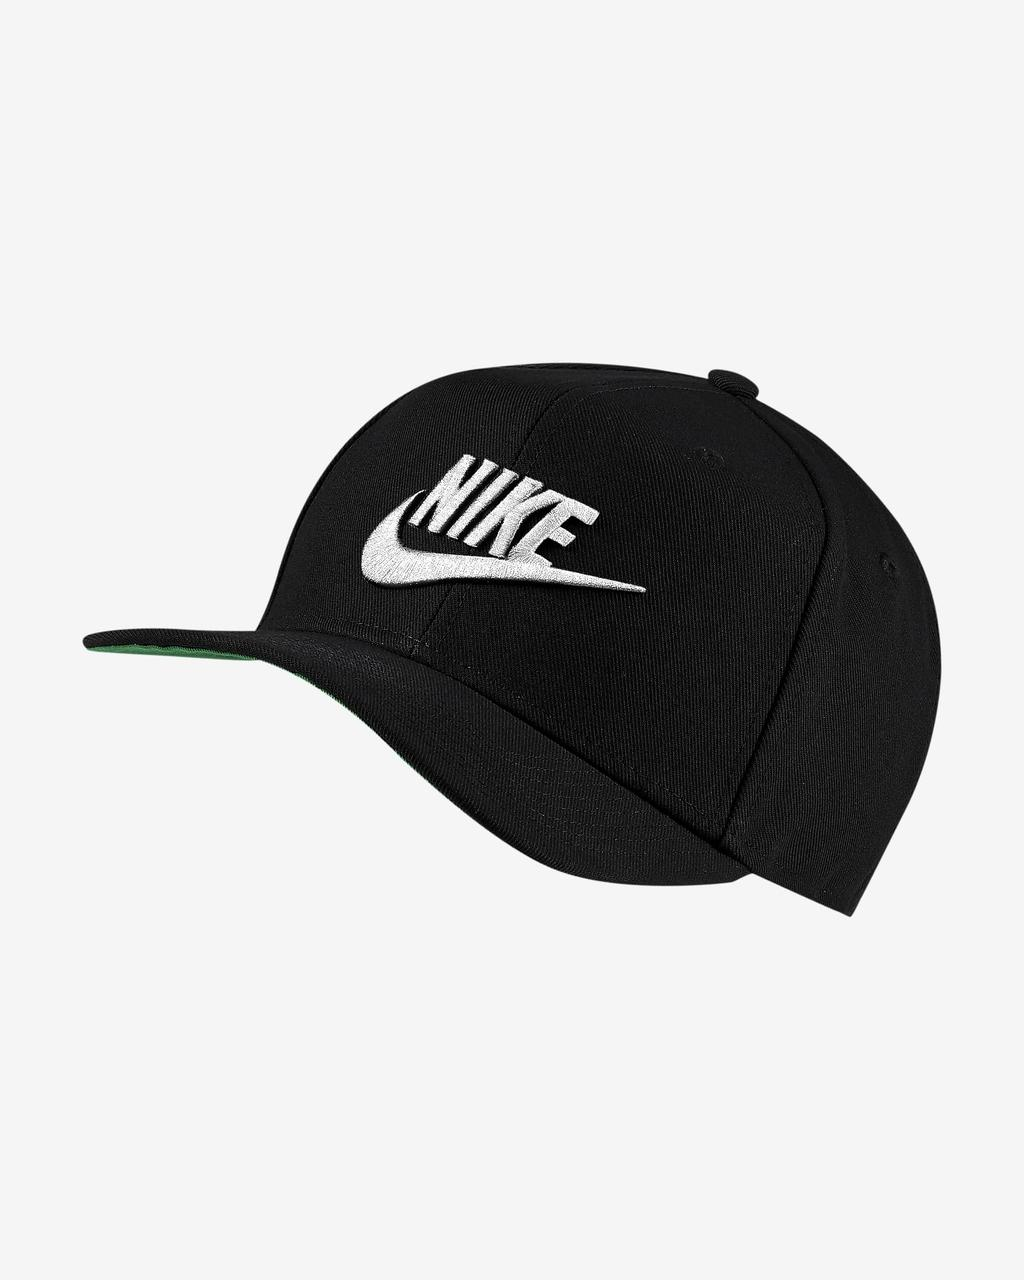 Кепка мужская Nike Sportswear Dri-FIT Pro Futura 891284-010 Черный